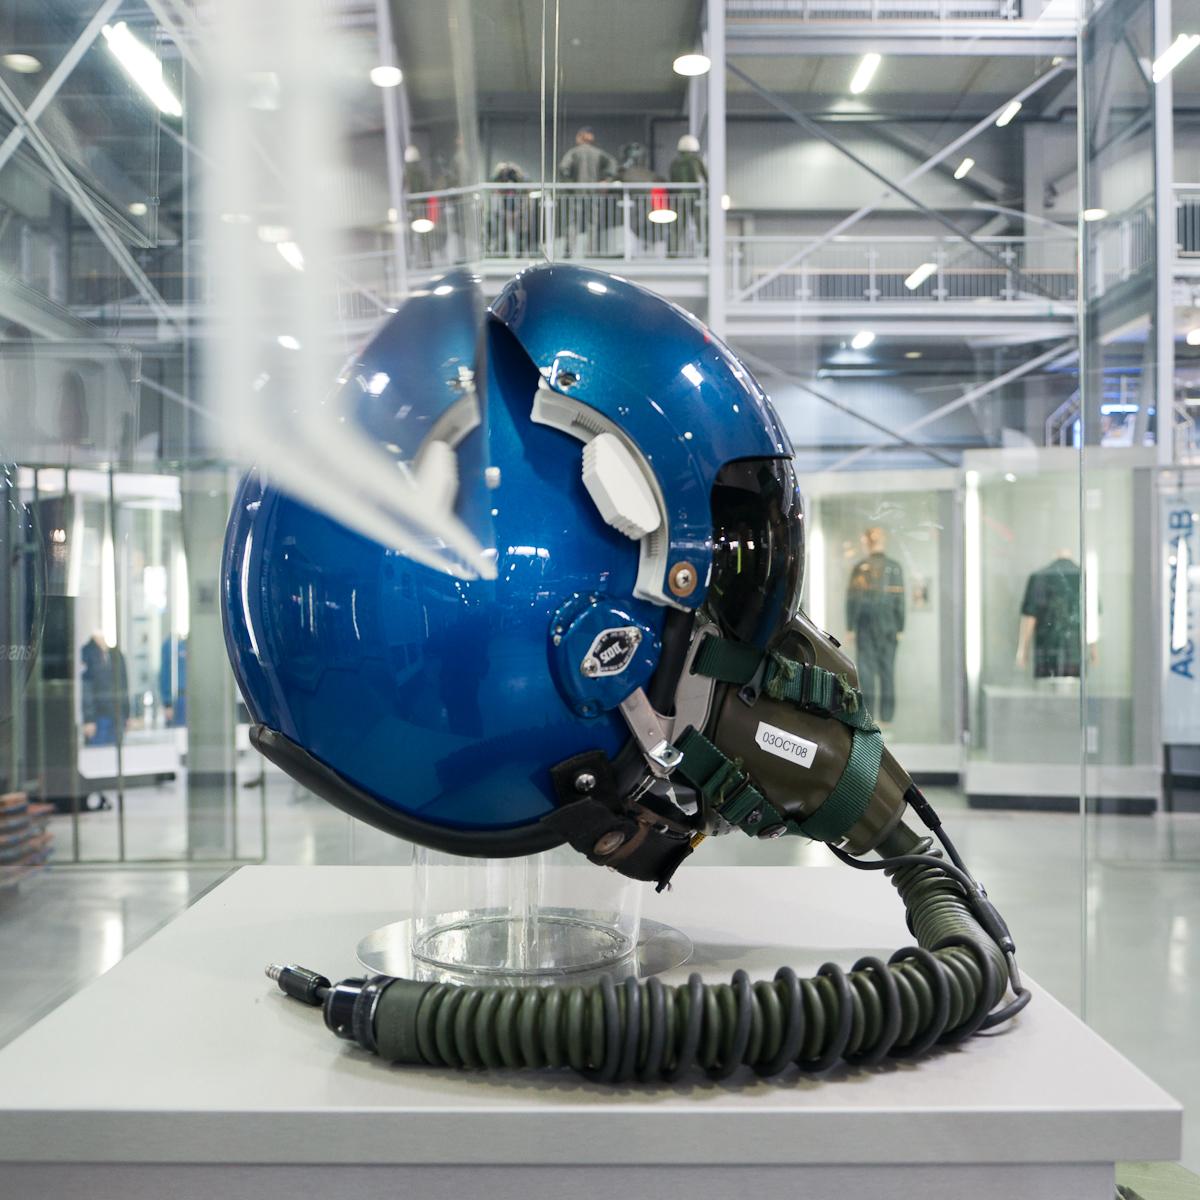 nasa pilot helmet - photo #14